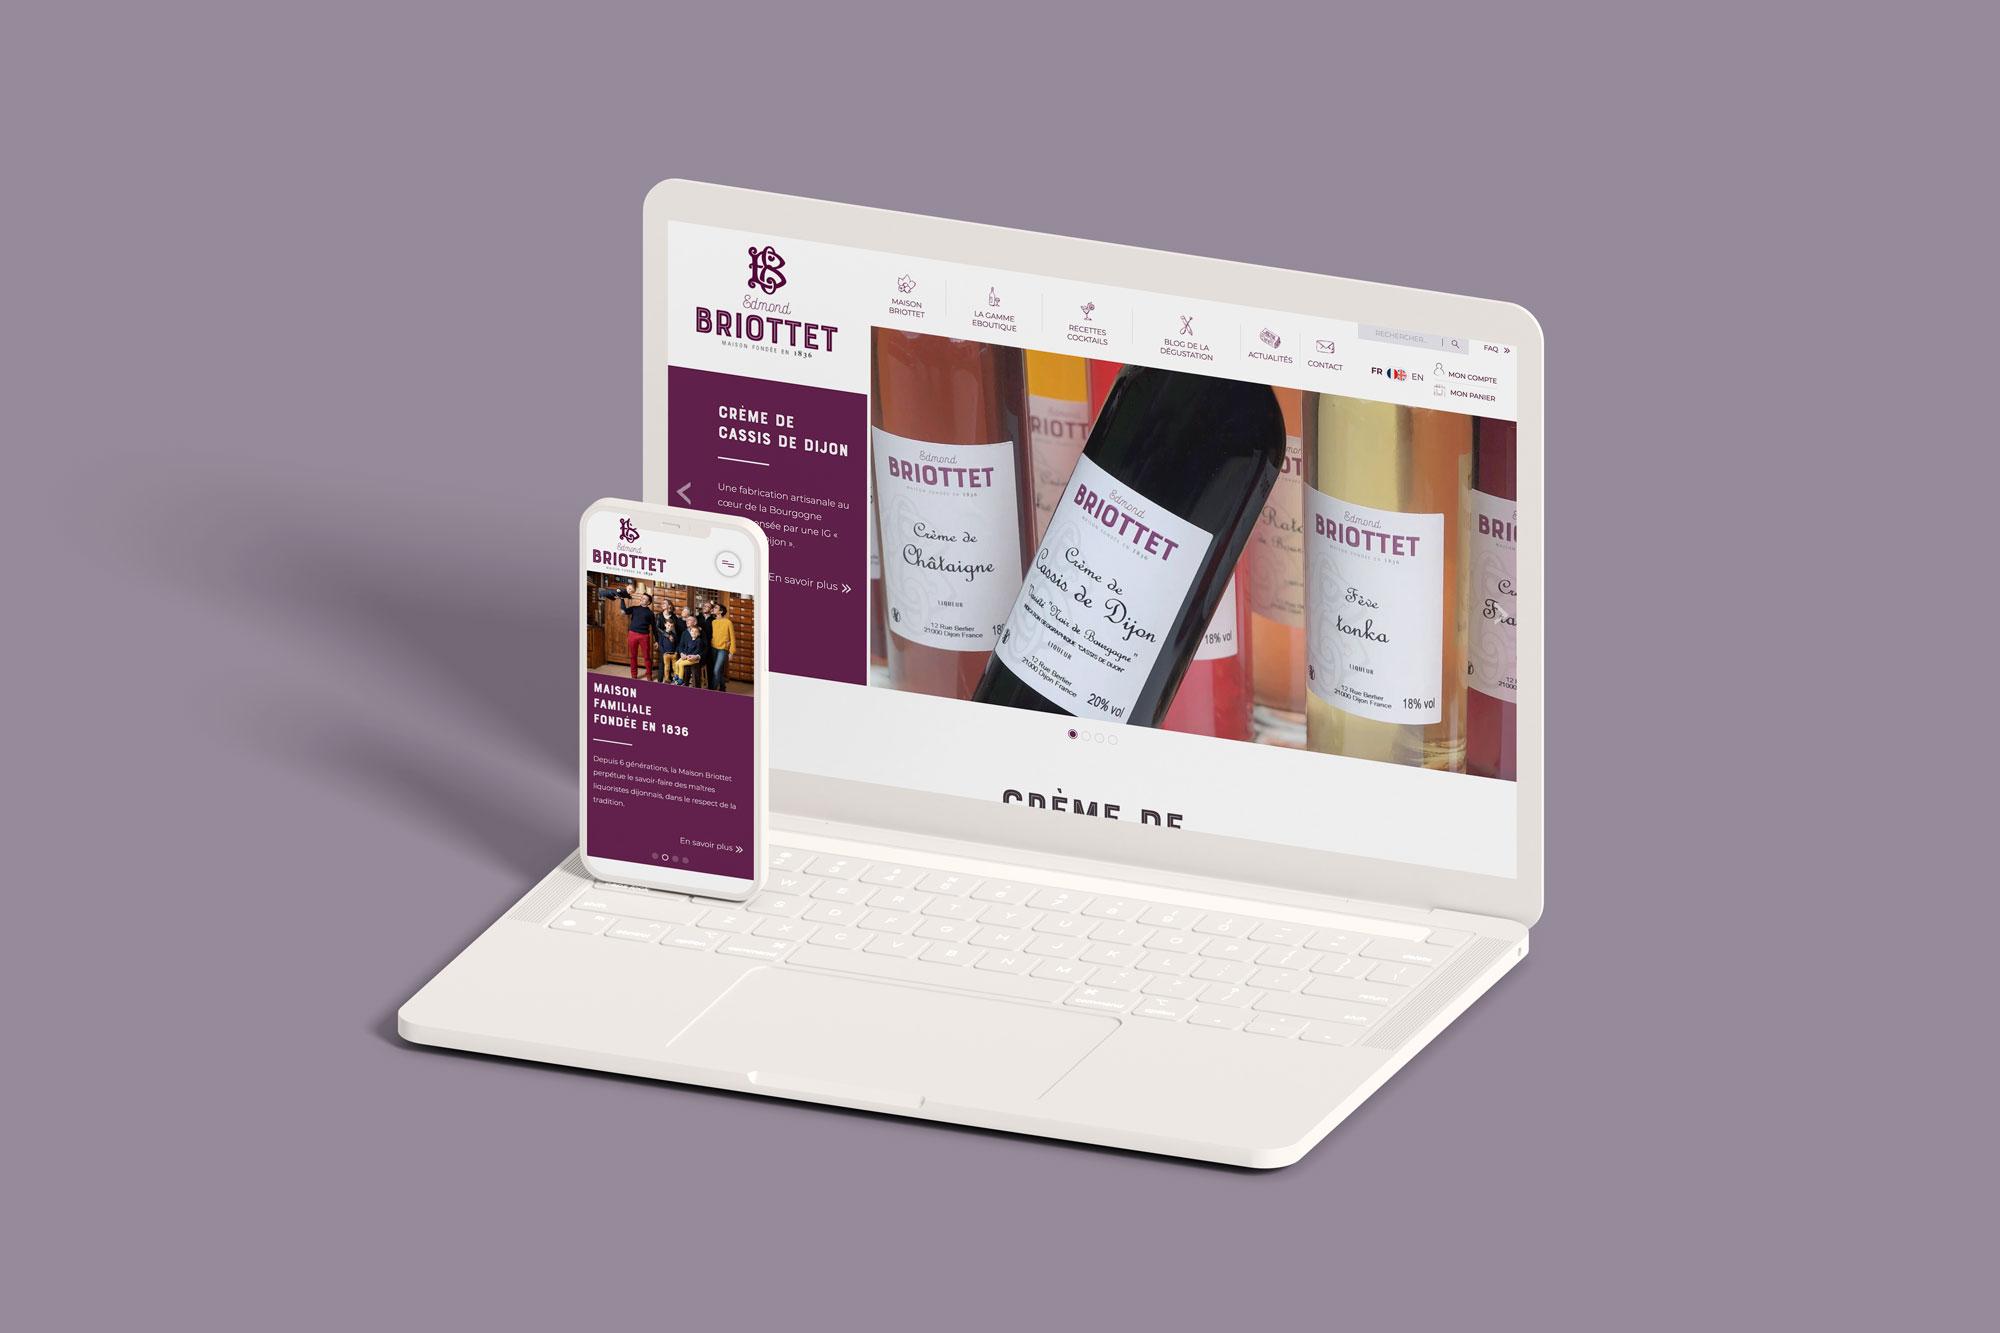 eclolink-agence-web-marketing-dijon-reference-client-briottet-mockup-responsive-web